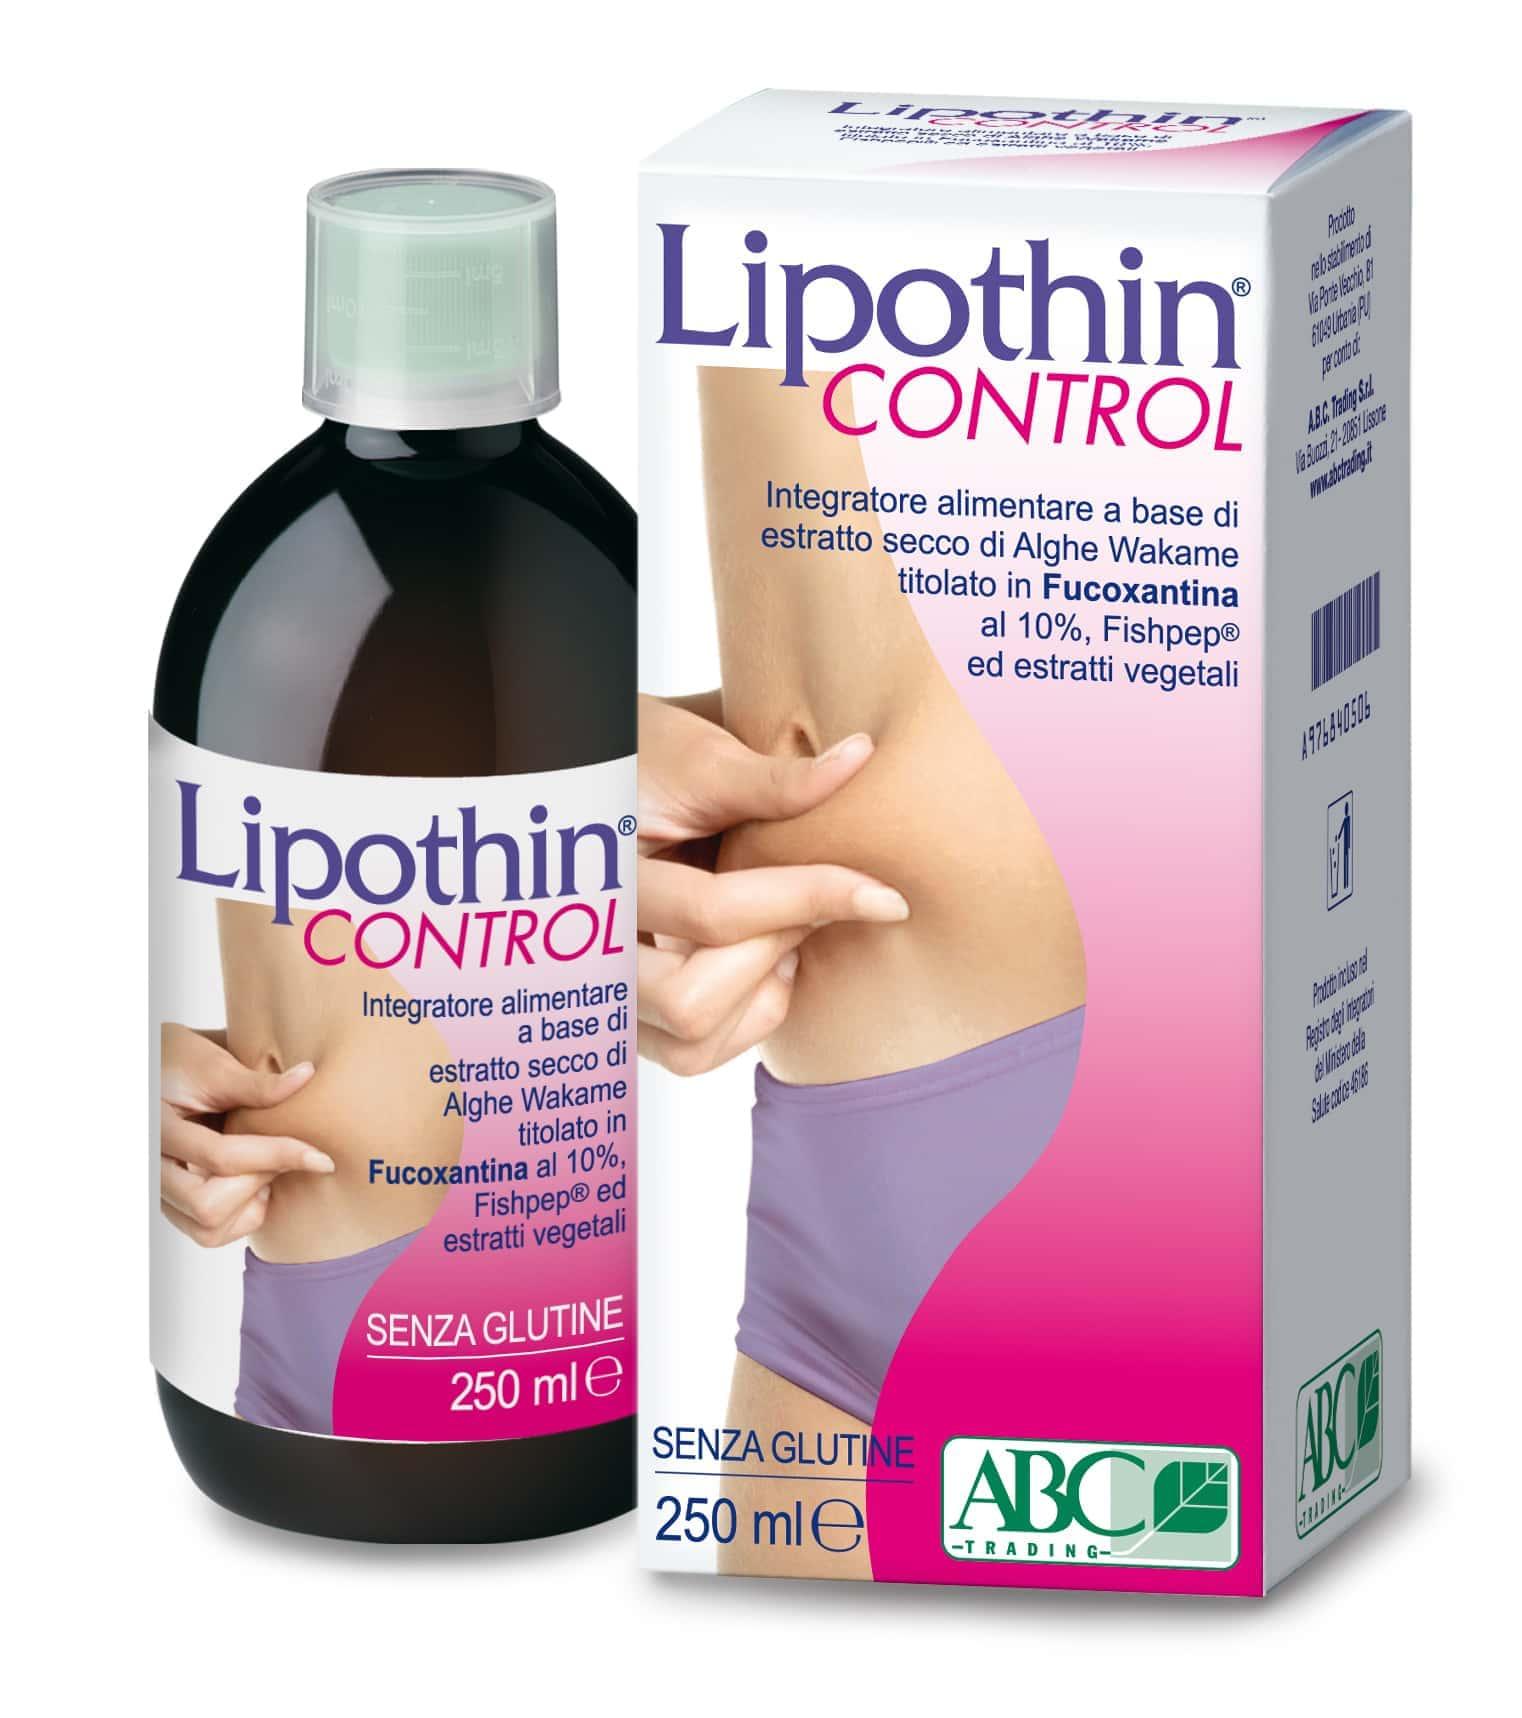 Lipothin control